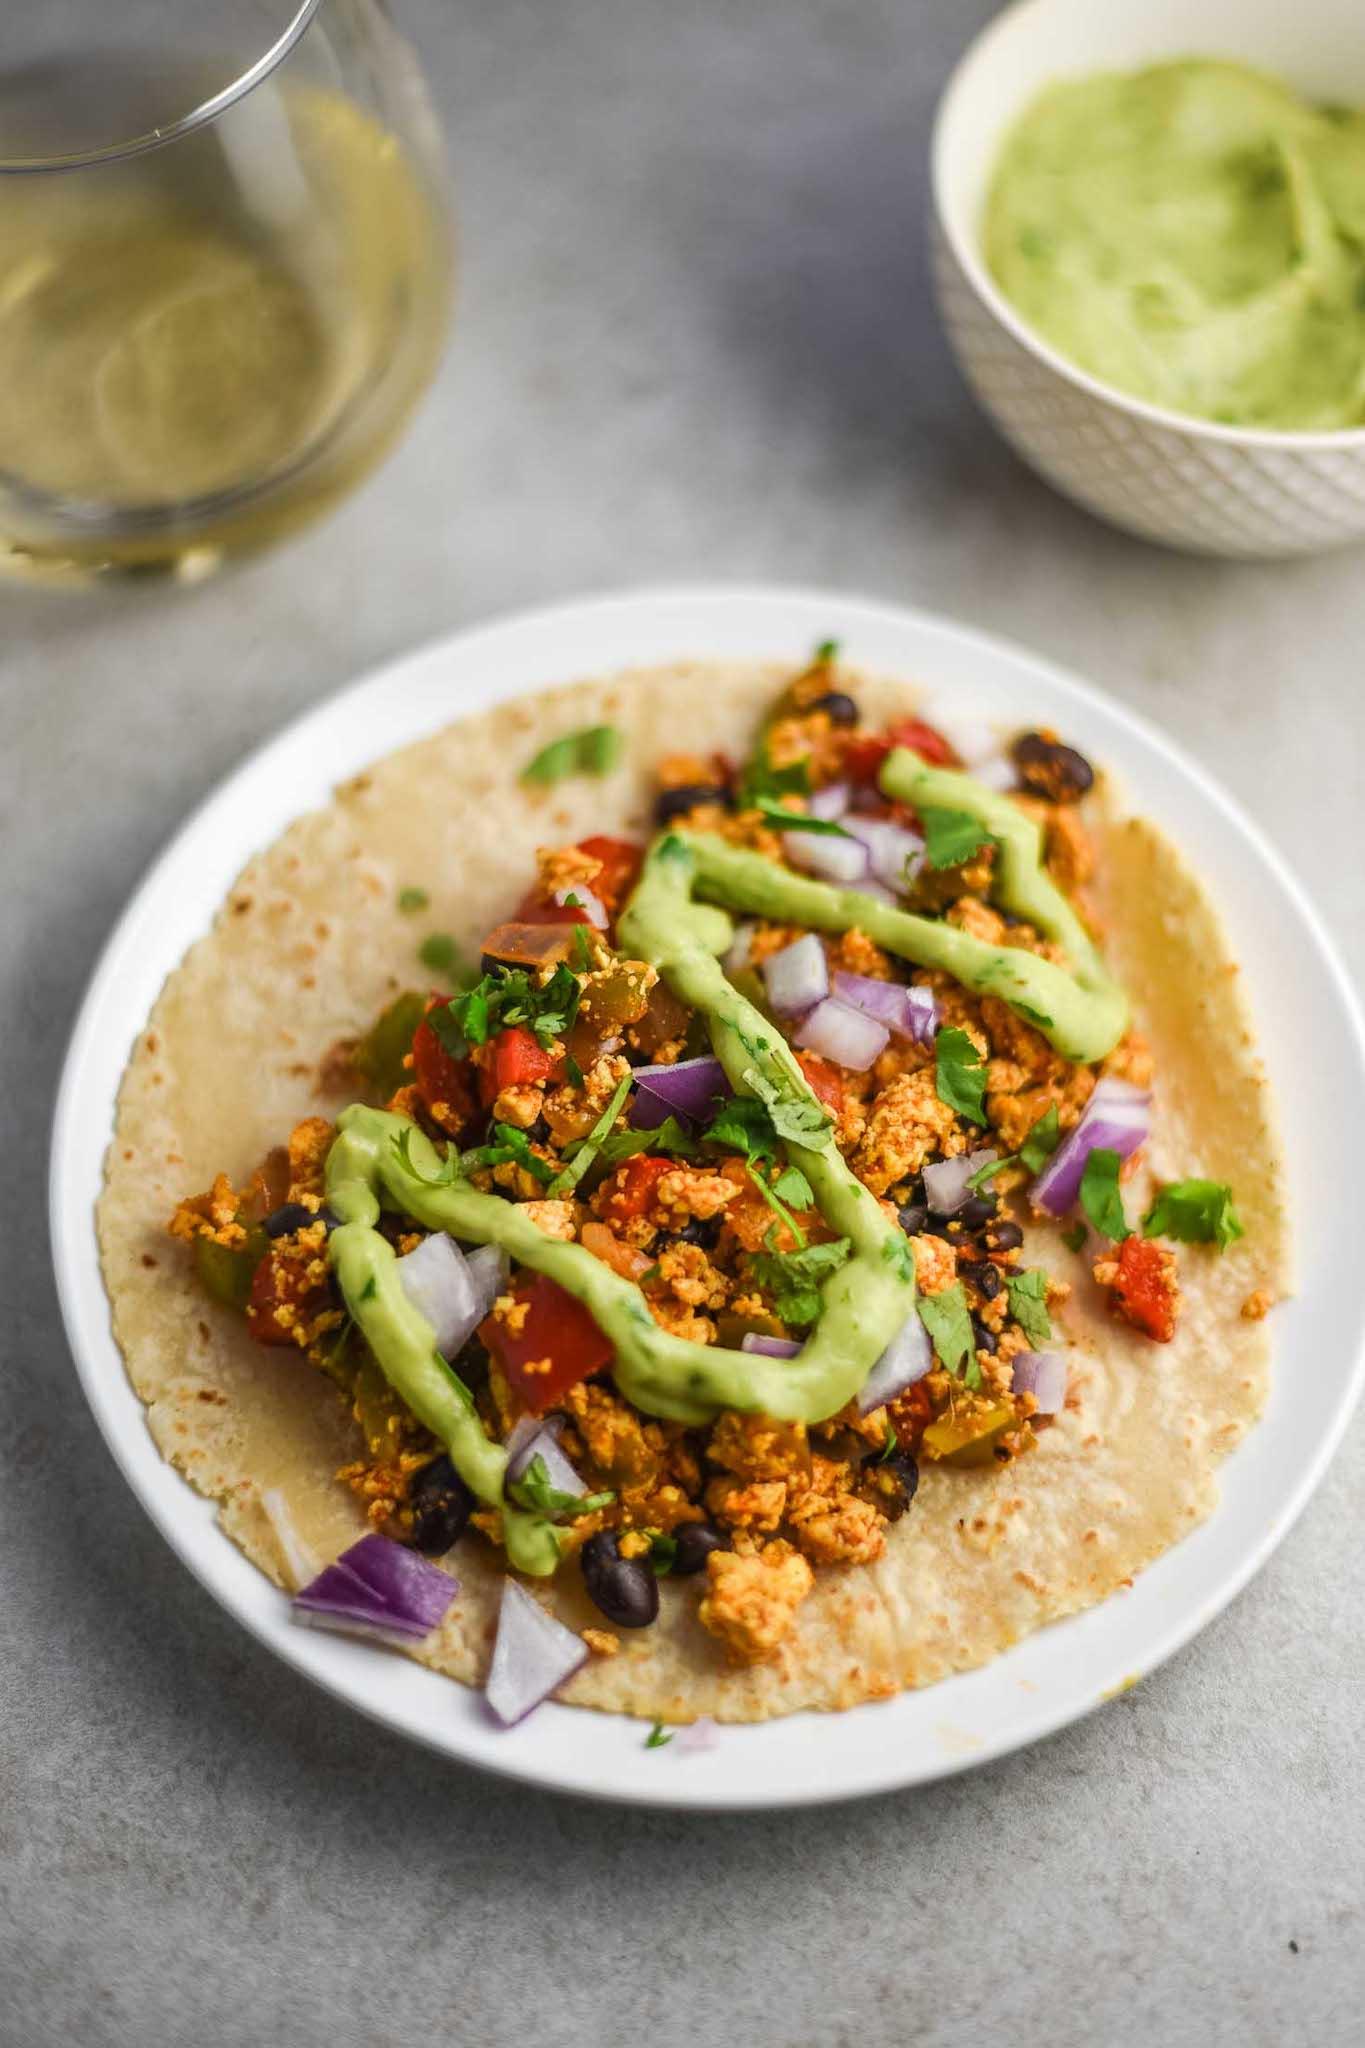 Healthy Vegan Breakfast Recipes, Tacos